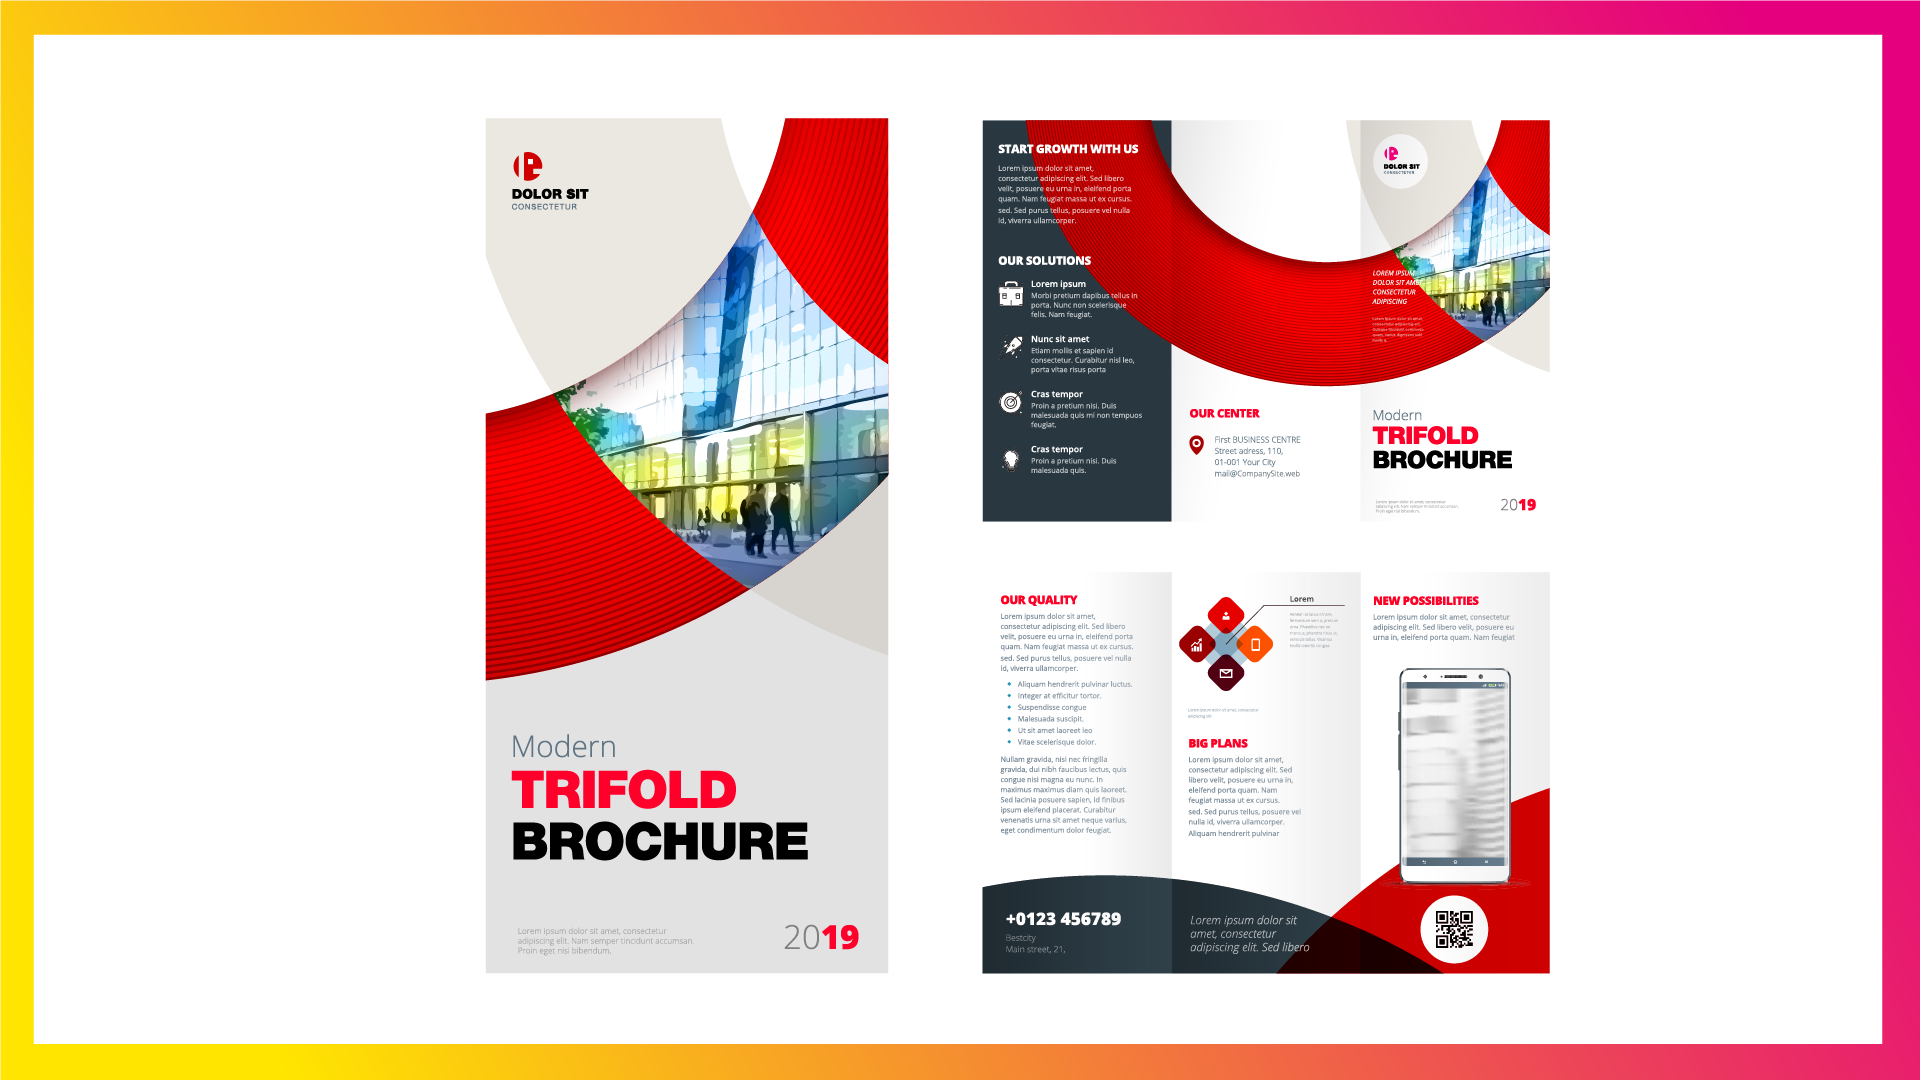 Printhub _brochures3-01.png